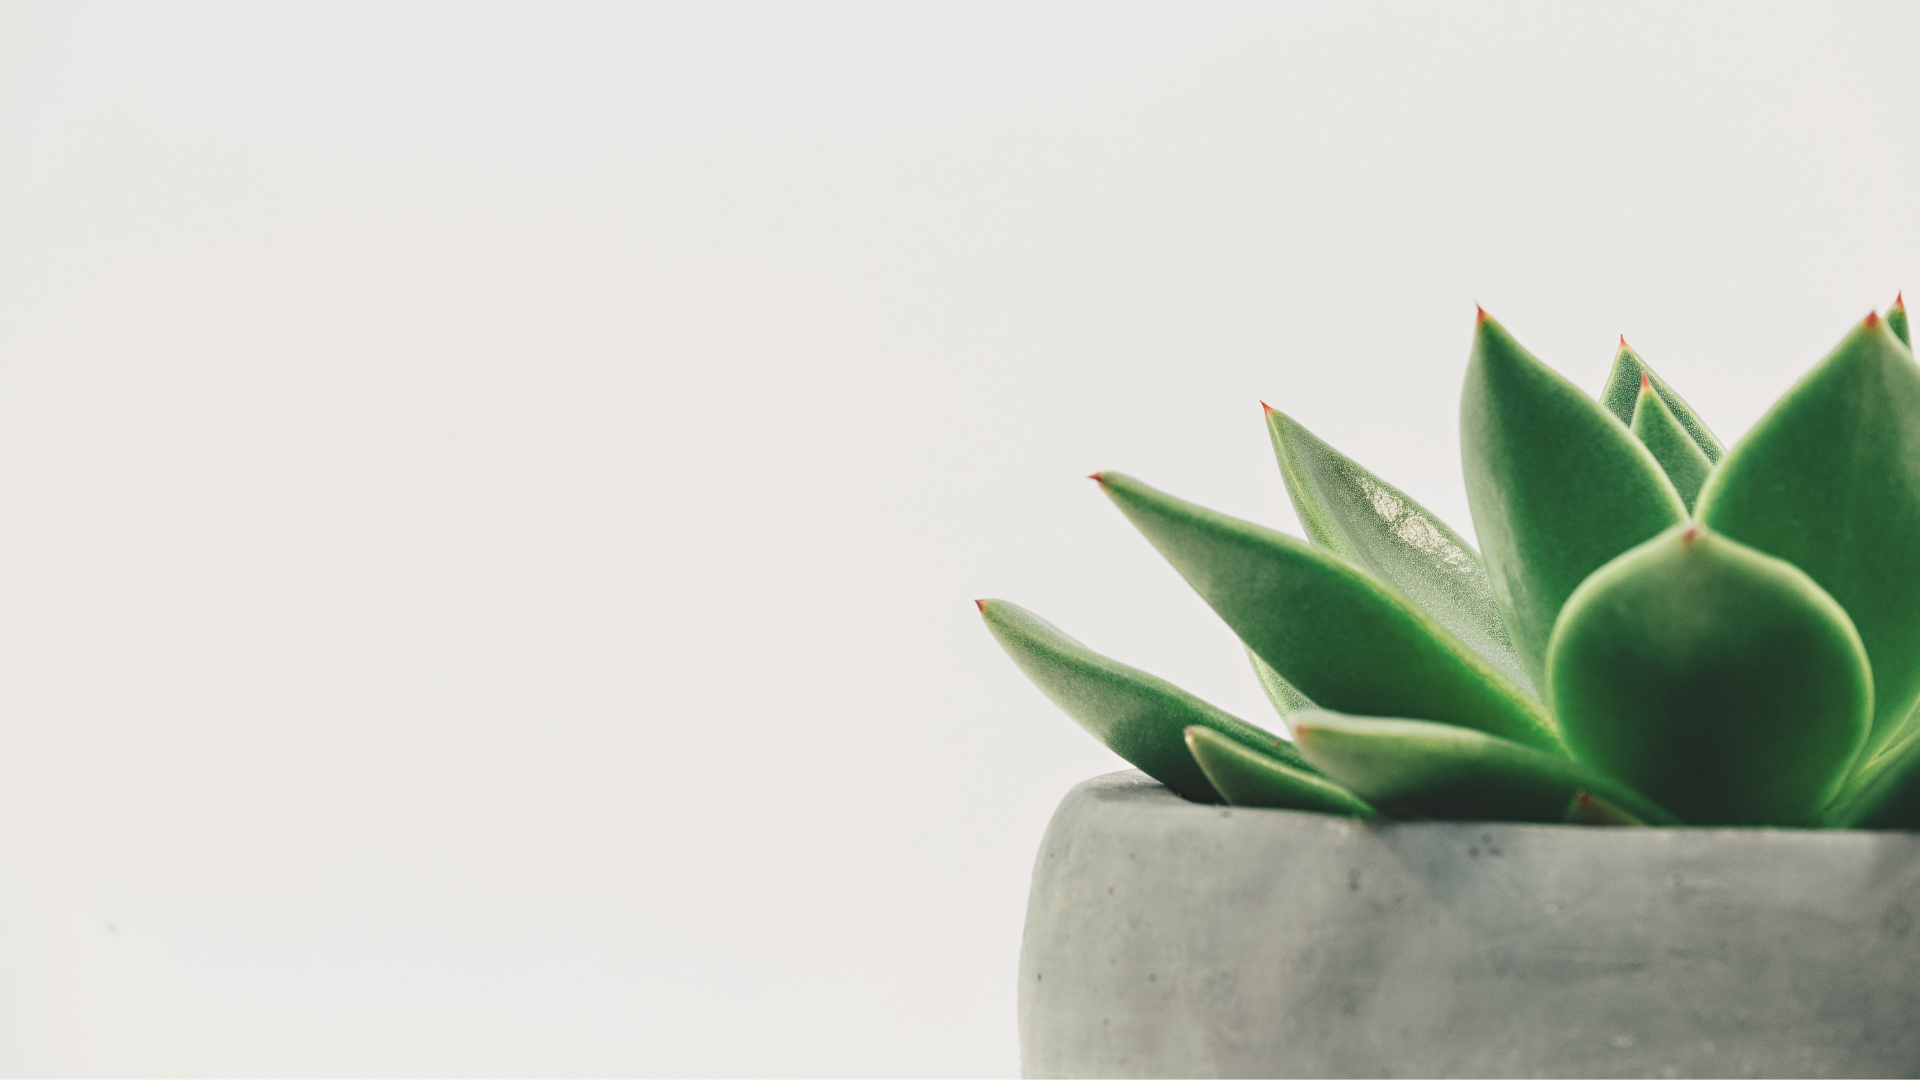 white-background-green-plant